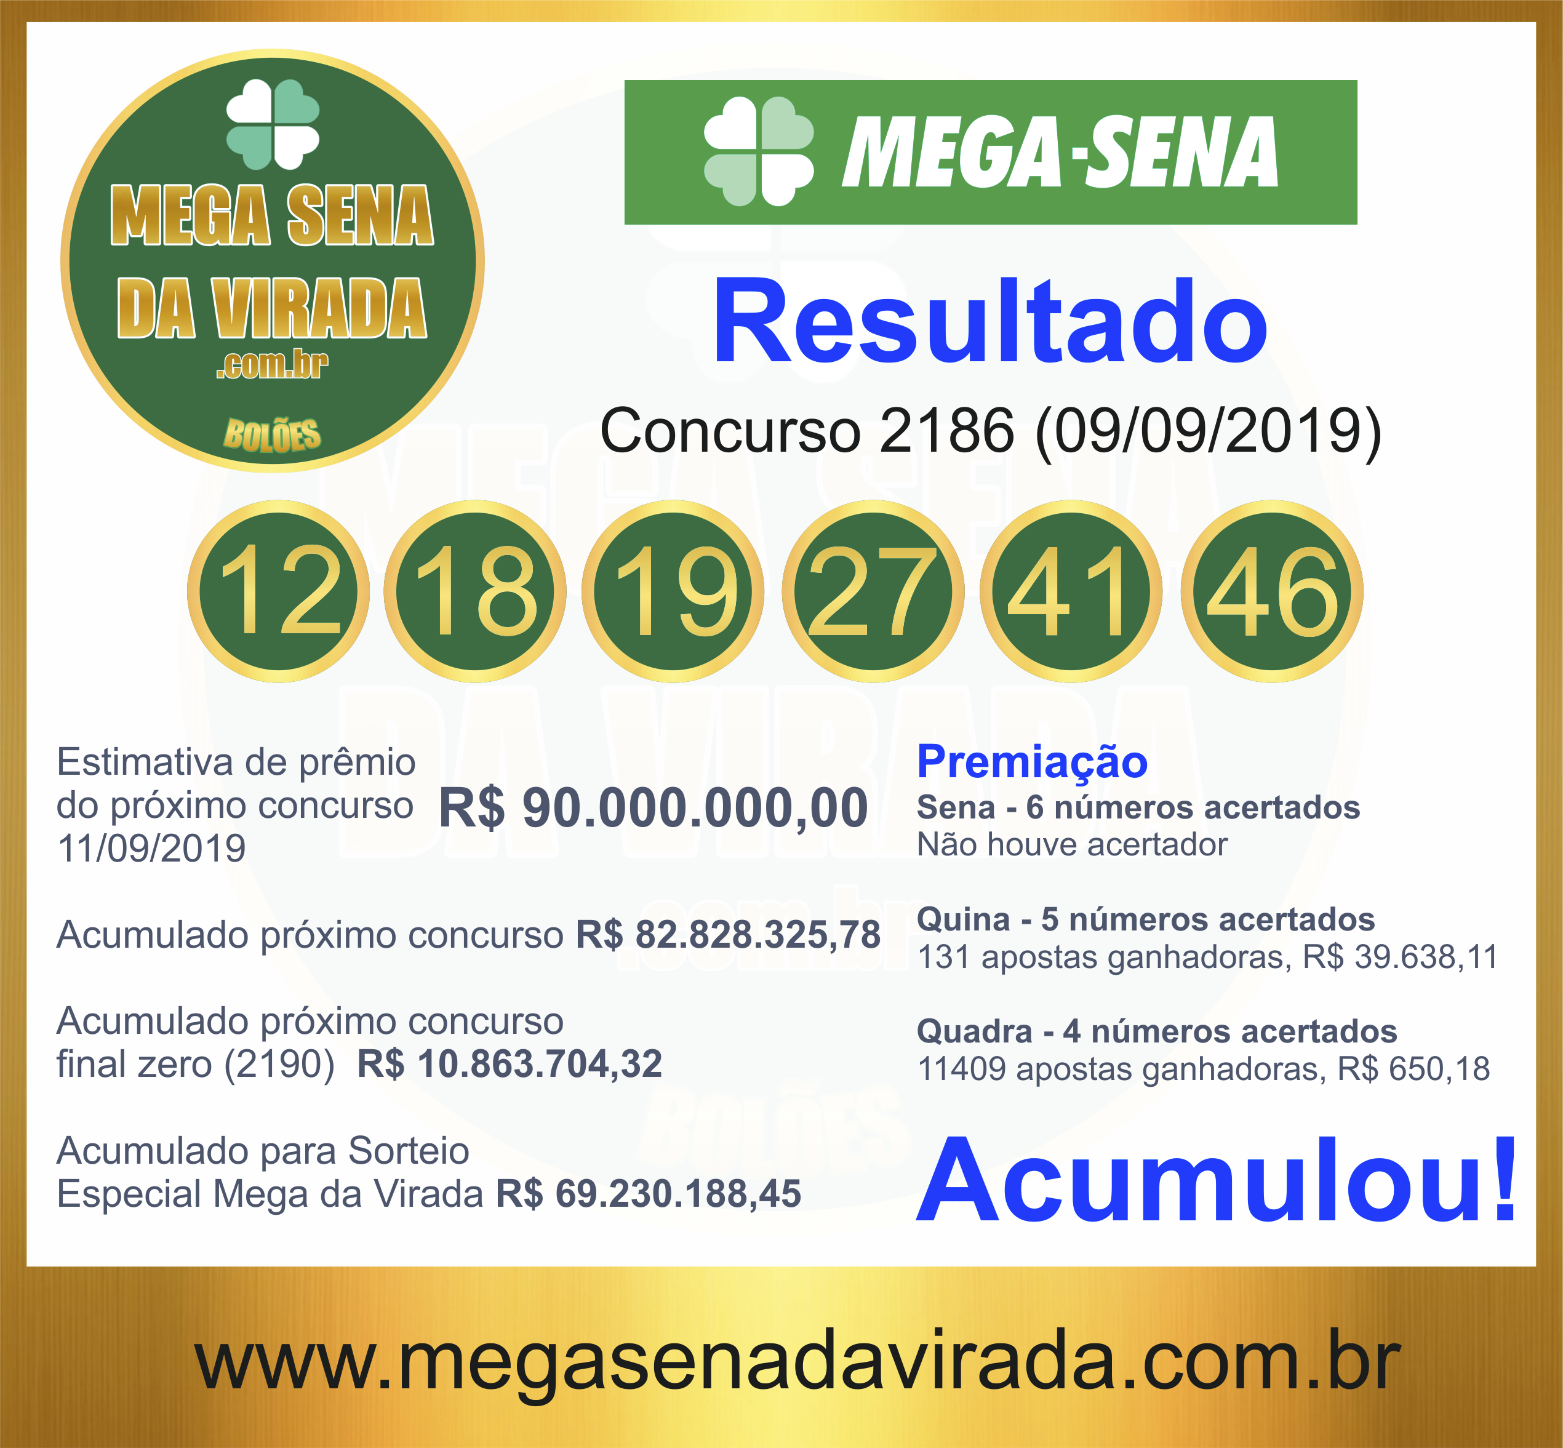 Mega Sena Concurso 2186 09/09/2019